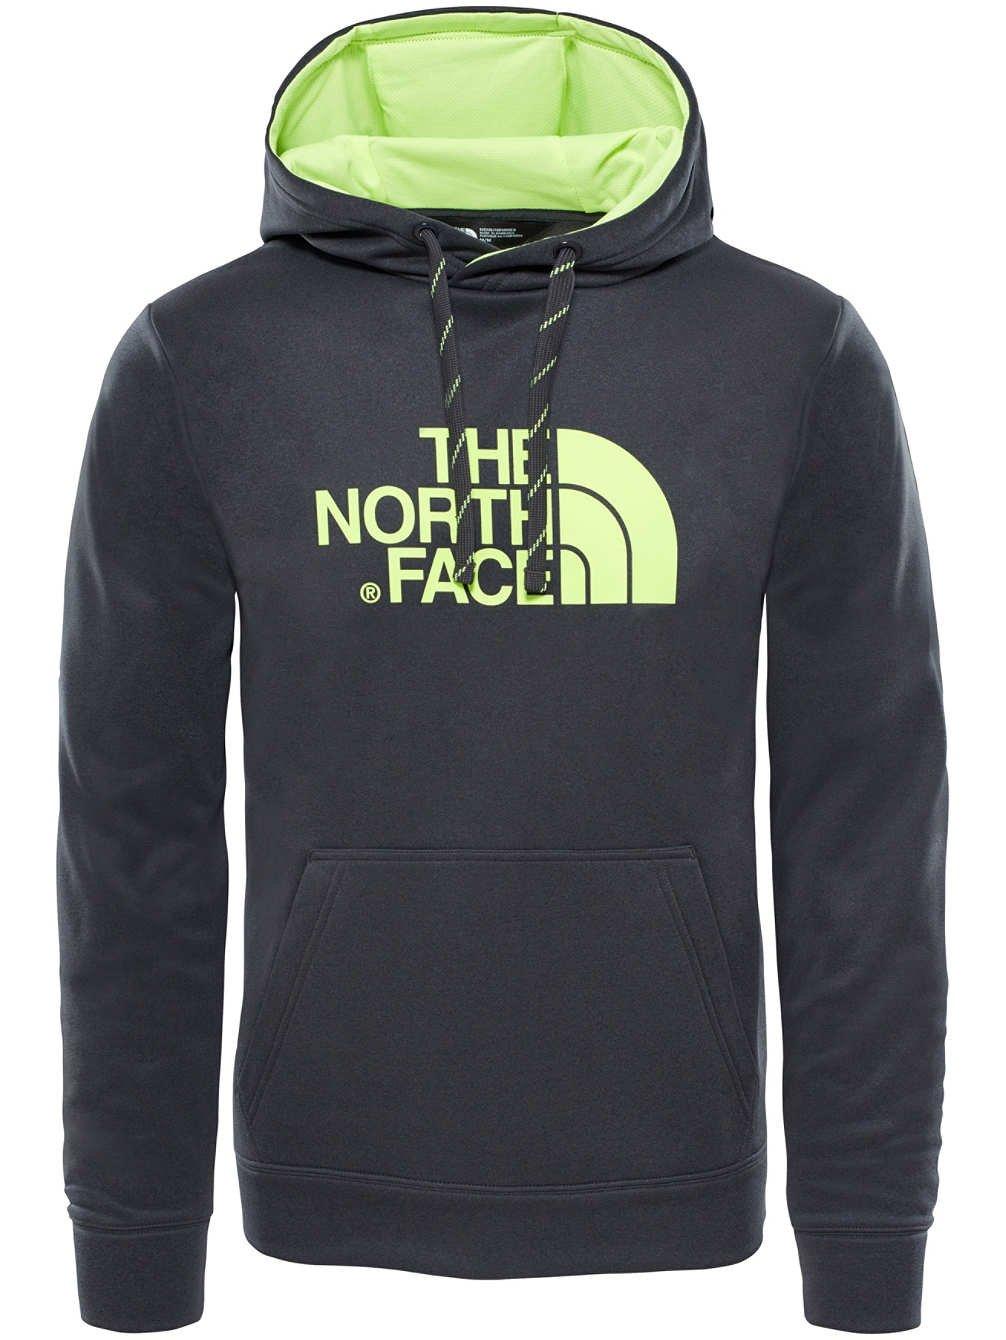 THE NORTH FACE M Süden hd-eu D, Sweatshirt